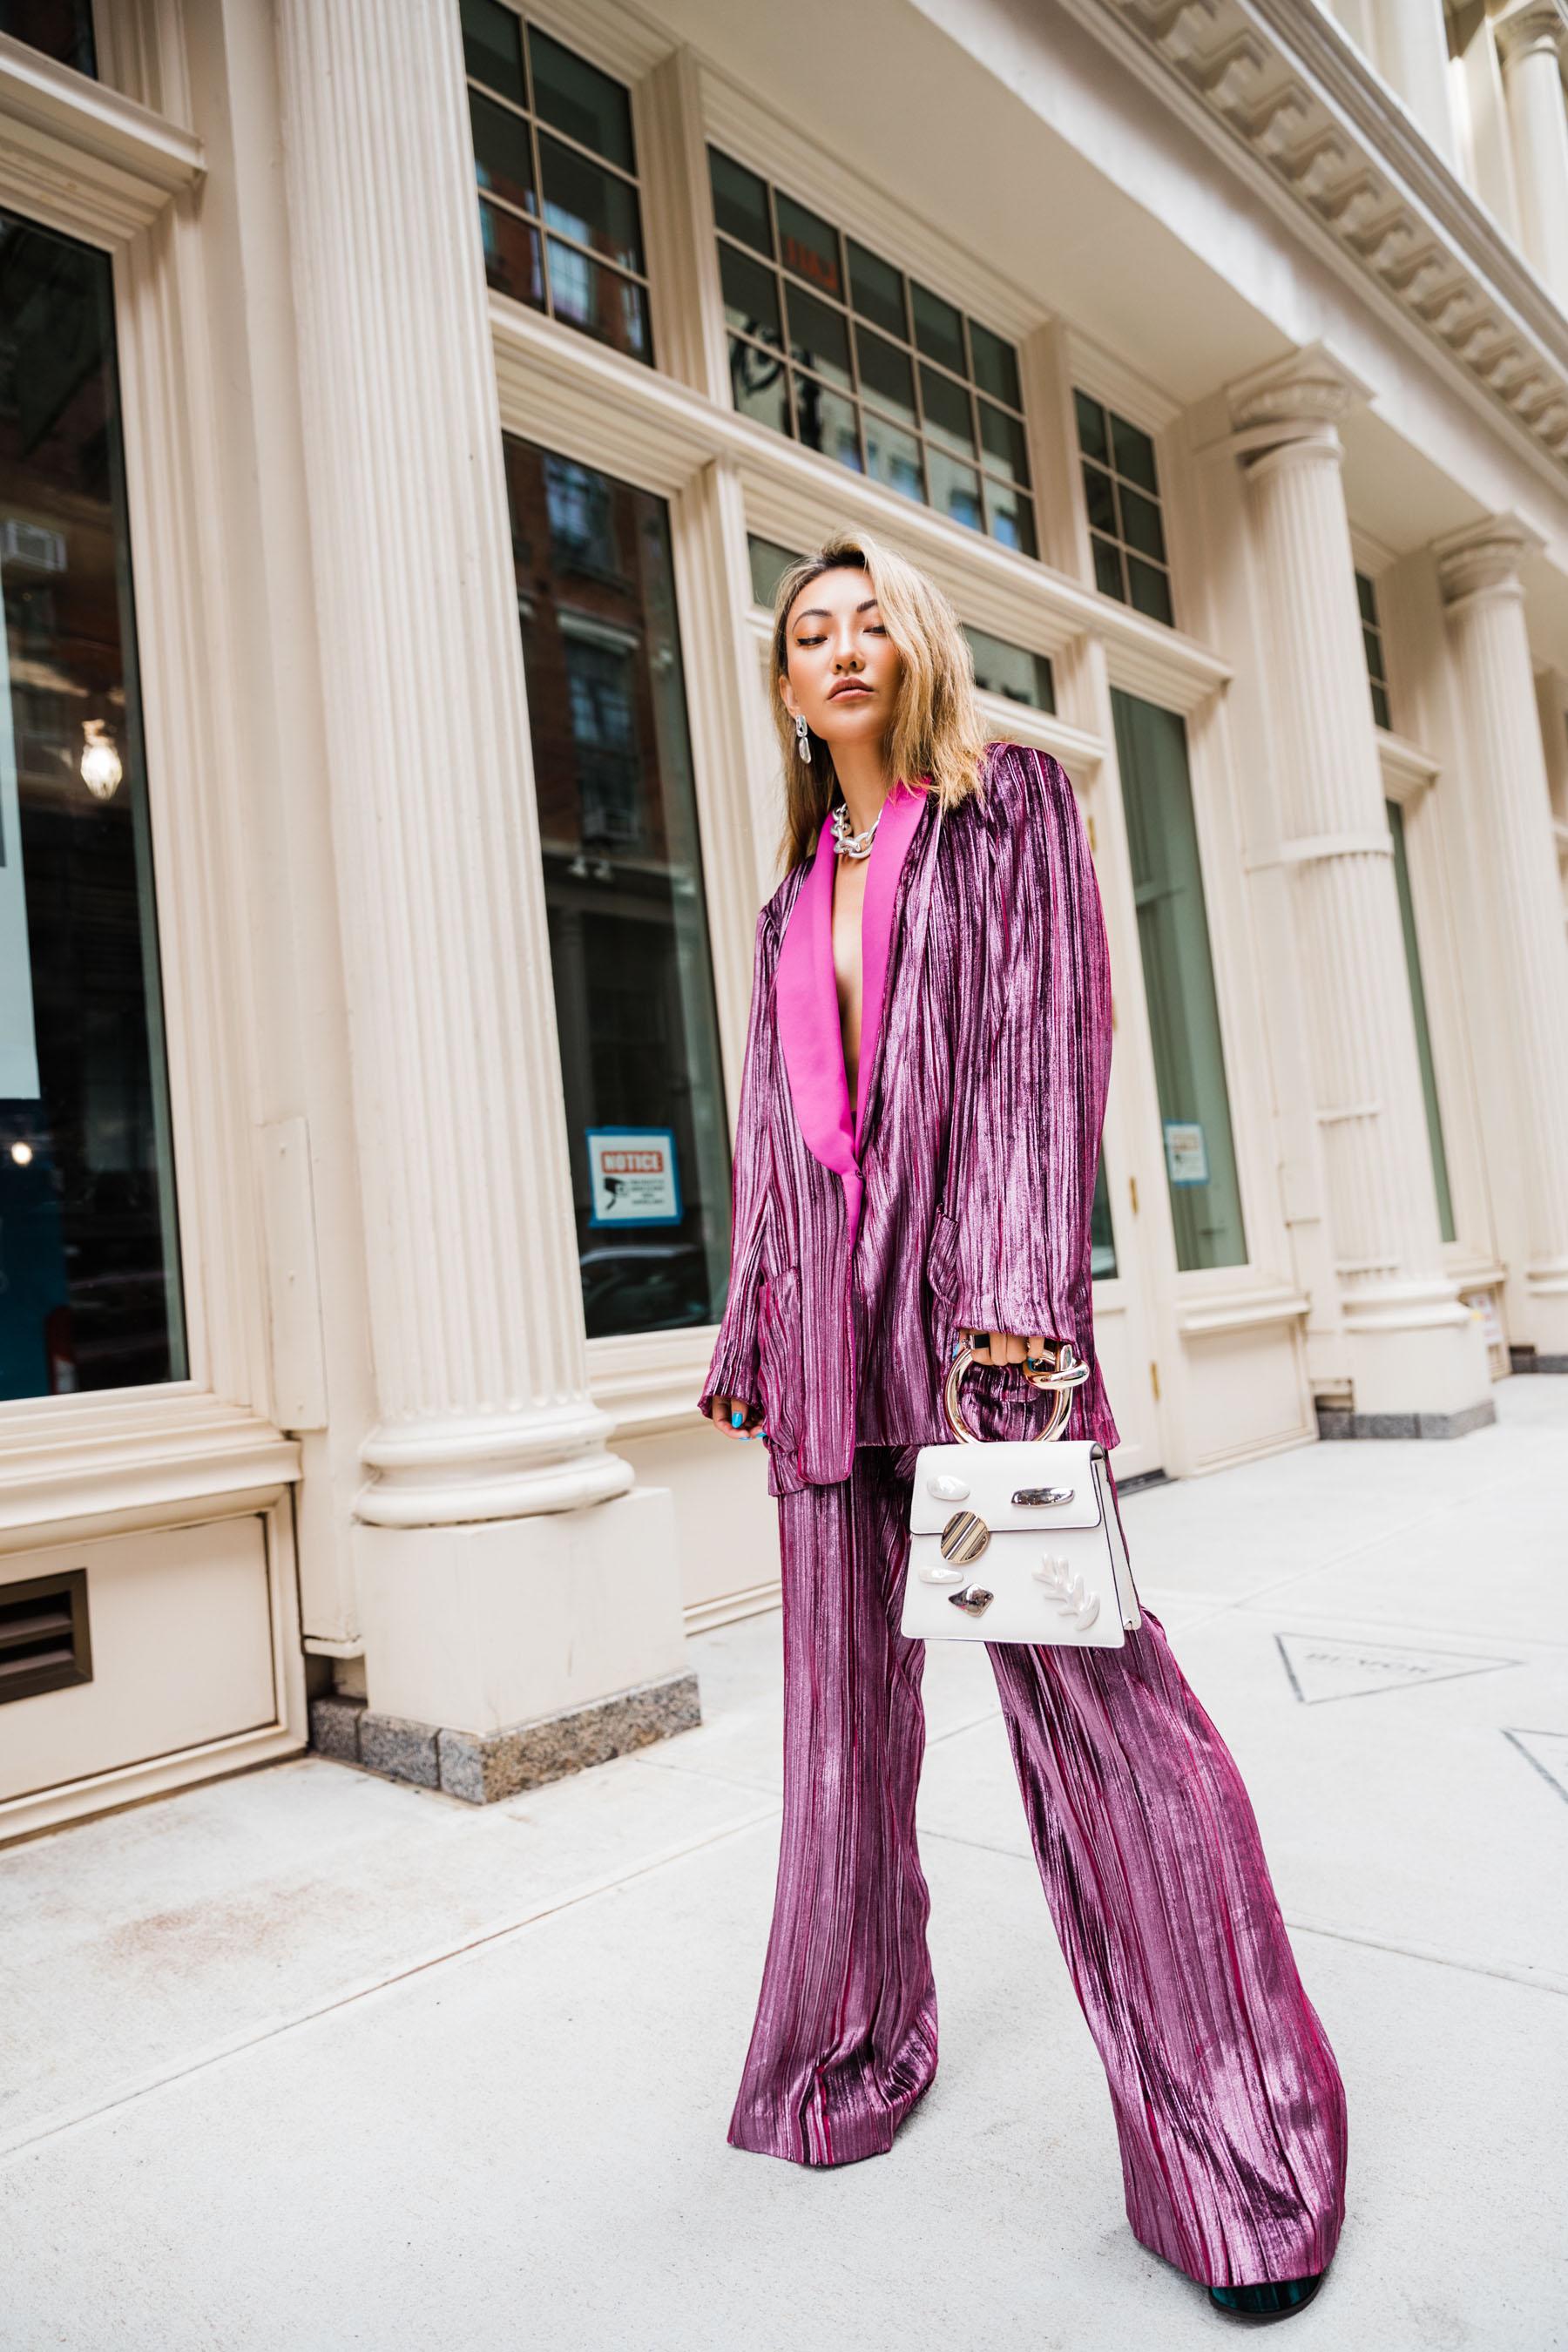 nyfw ss20, mpink shimmery suit, velvet pants, pink velvet blazer, nyfw street style // Notjessfashion.com